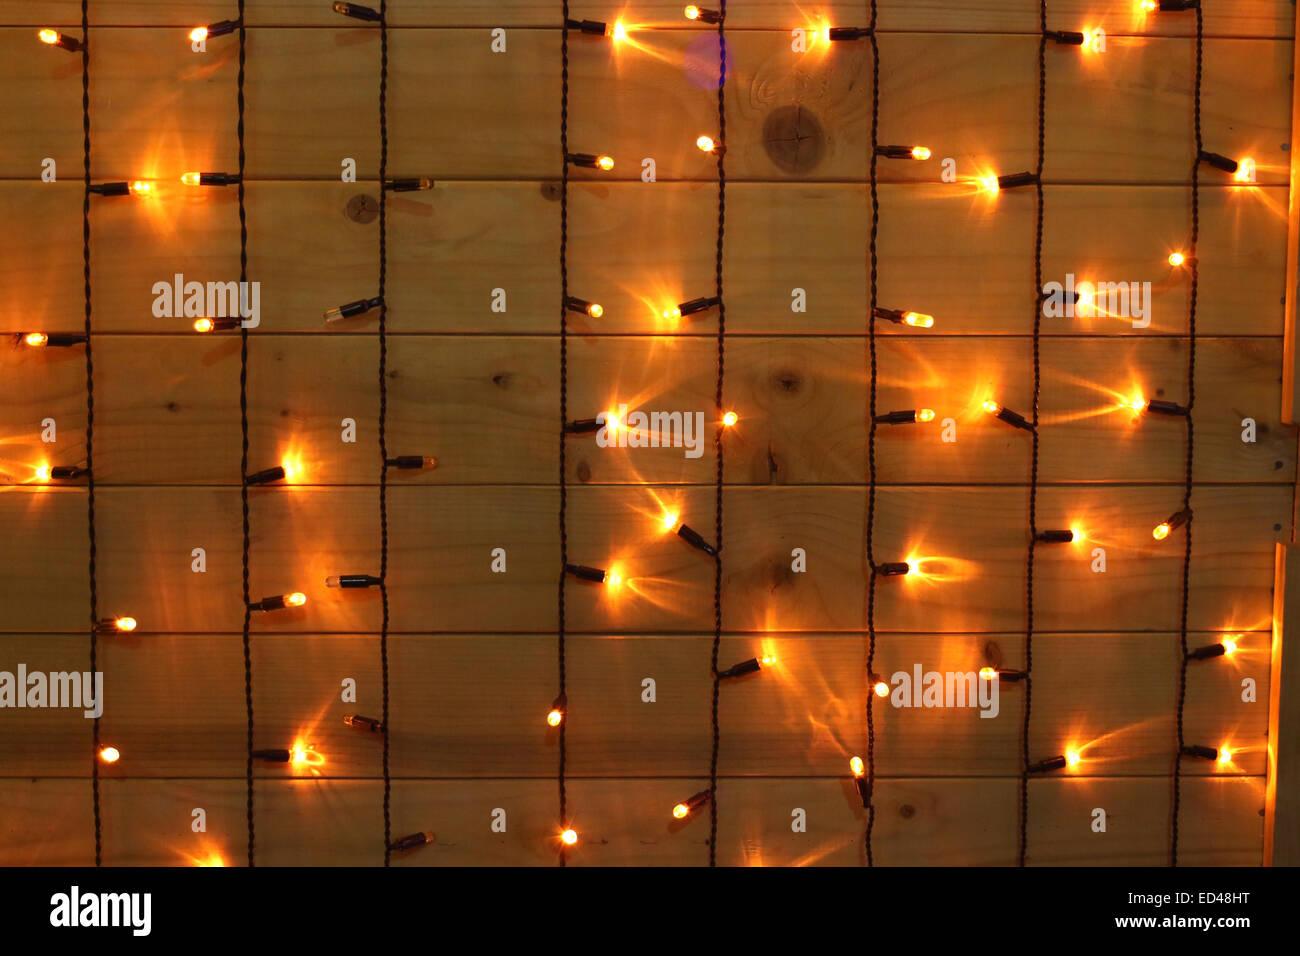 Christmastime ornament, little decorative adorned x-mas lights, wood glowing background - Stock Image